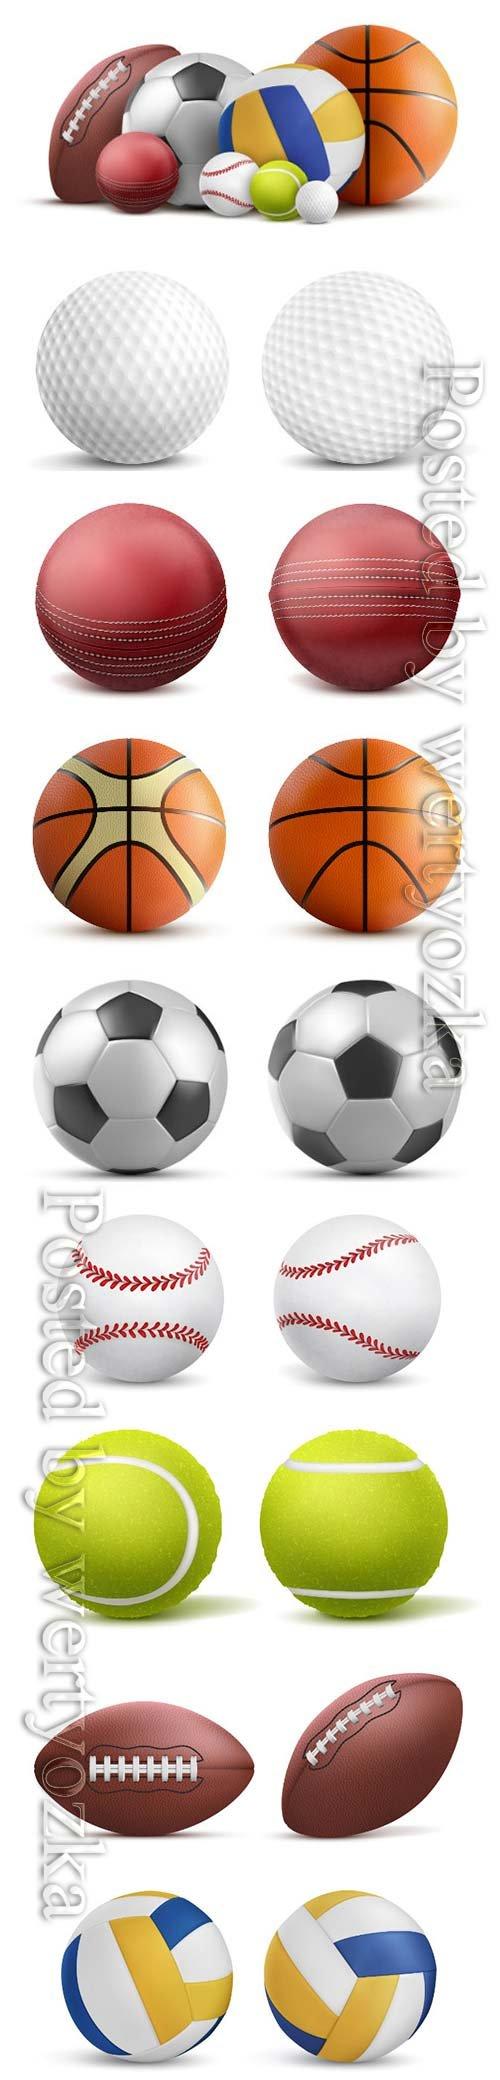 Sports balls, soccer, volleyball, baseball, tennis, golf, rugby vector template design